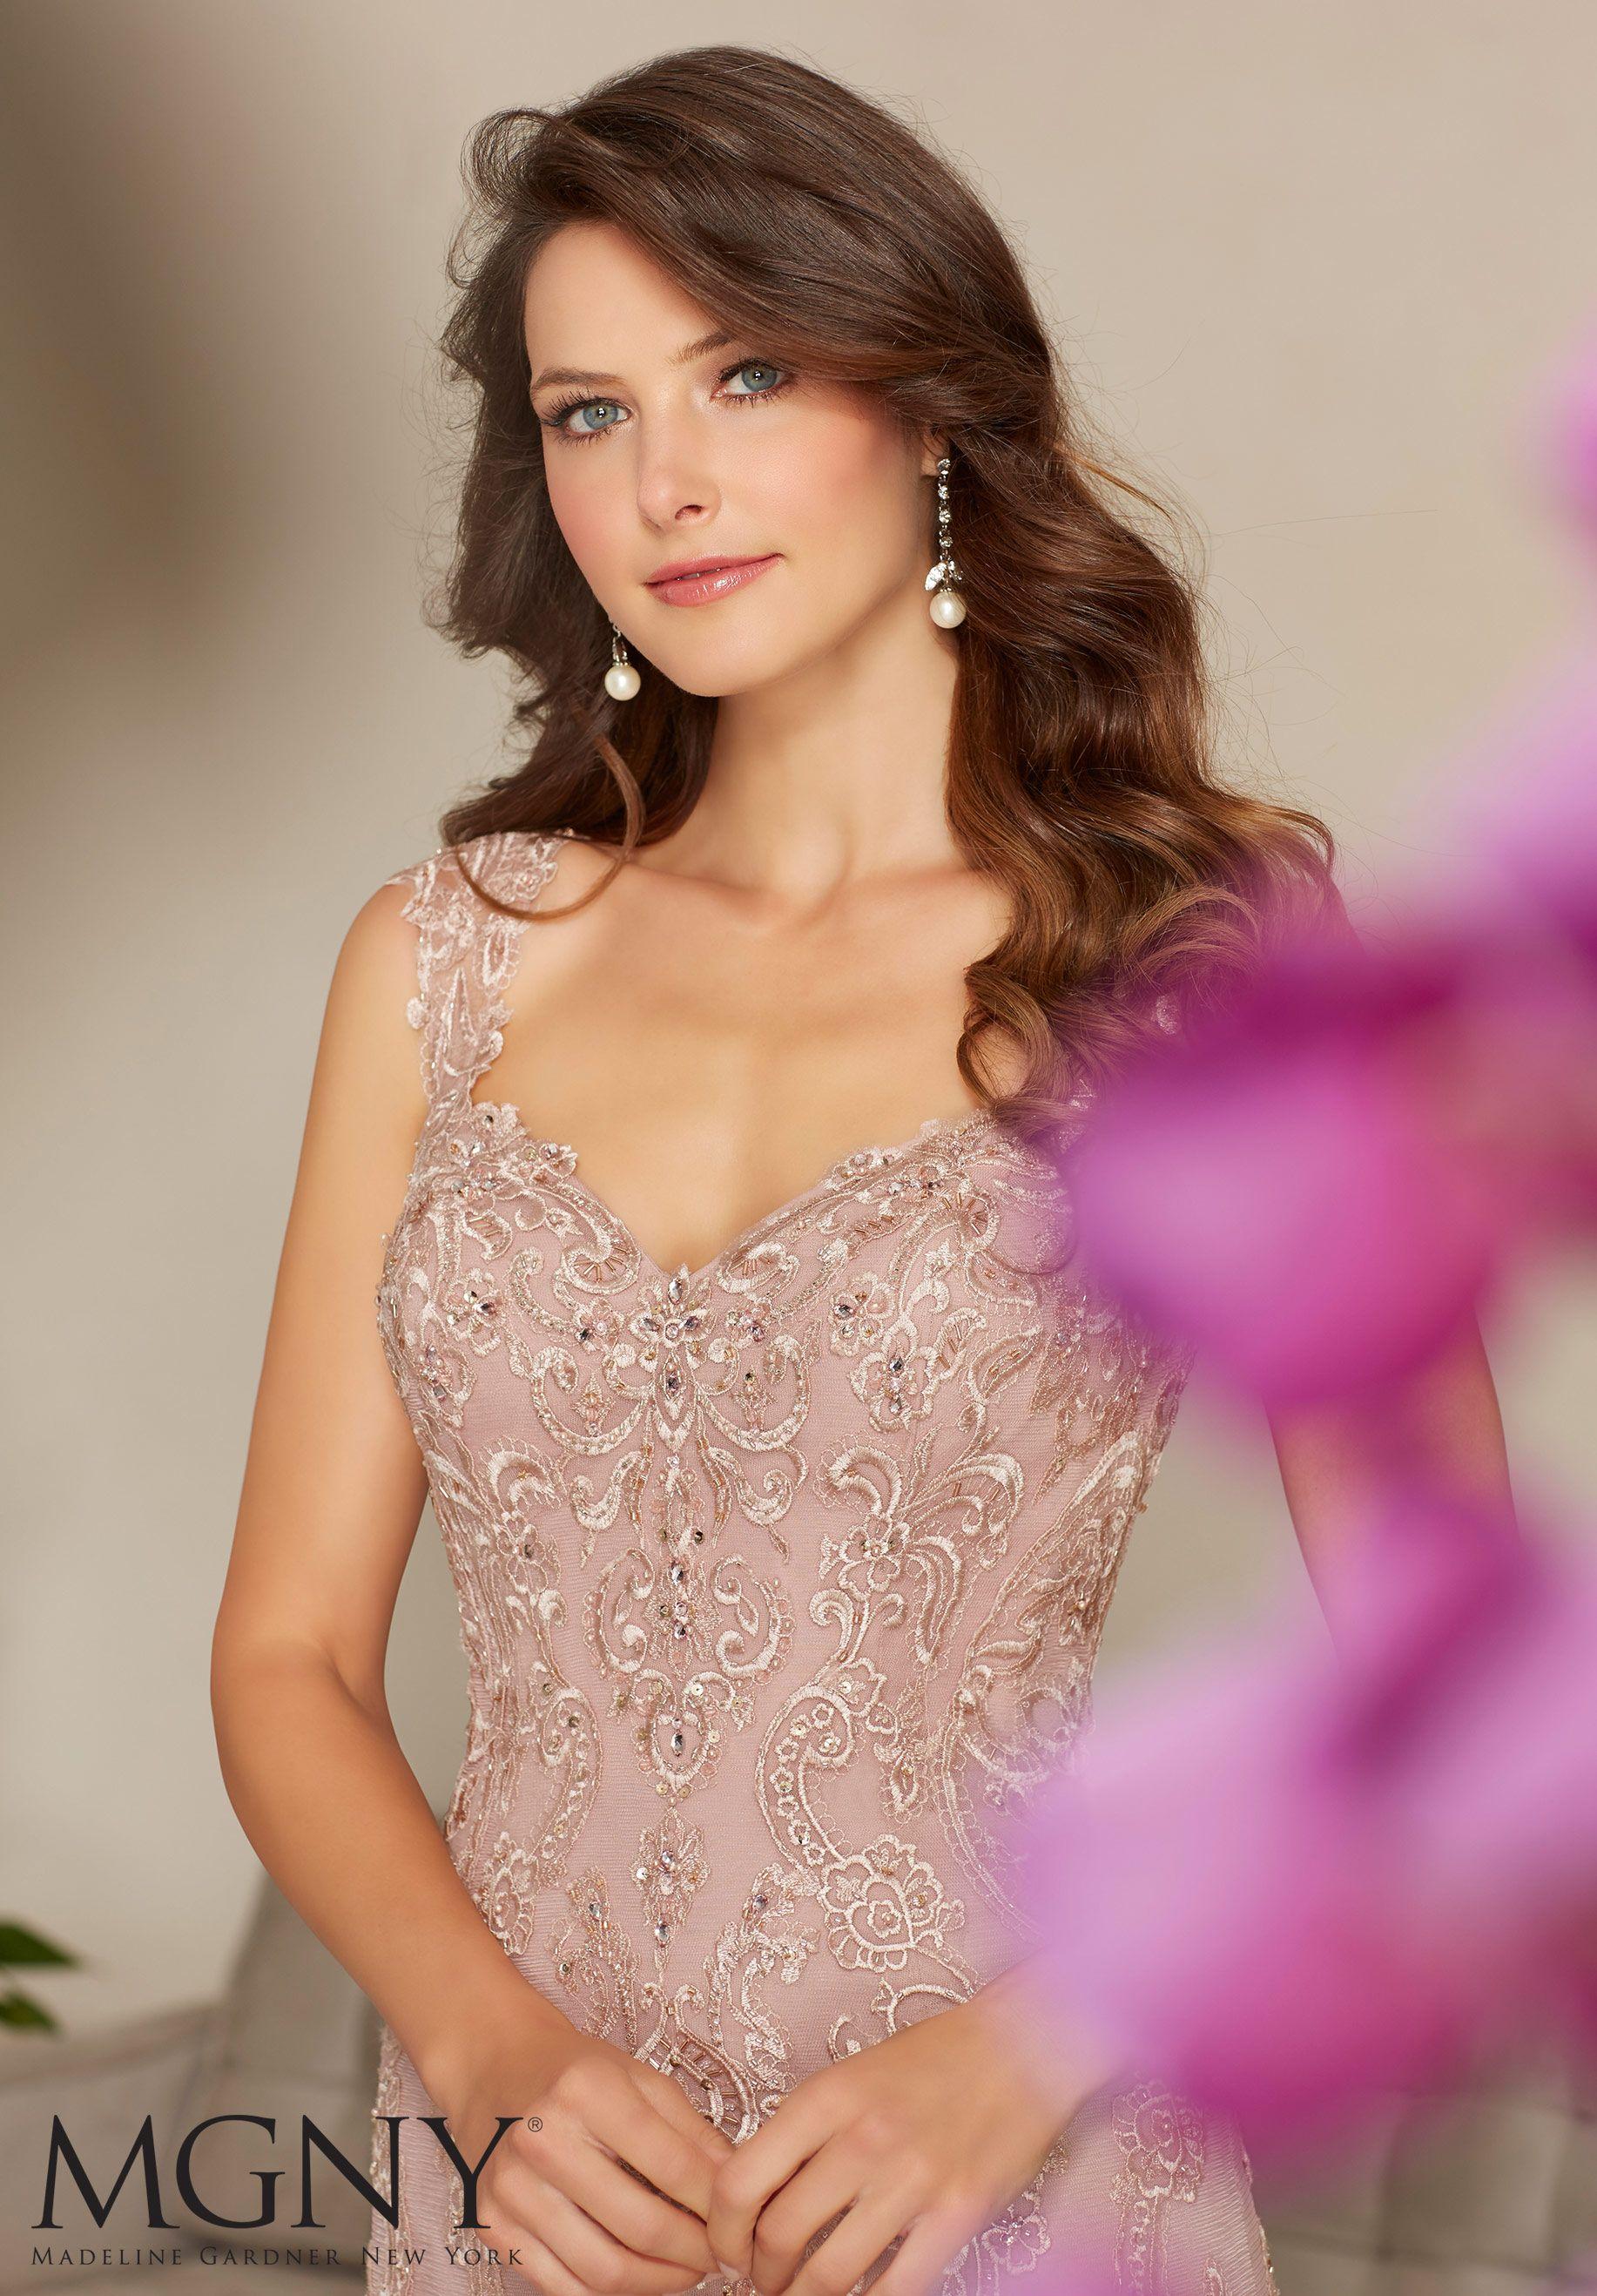 Pin de Amelia DeMelo en Heather | Pinterest | Vestidos de fiesta ...